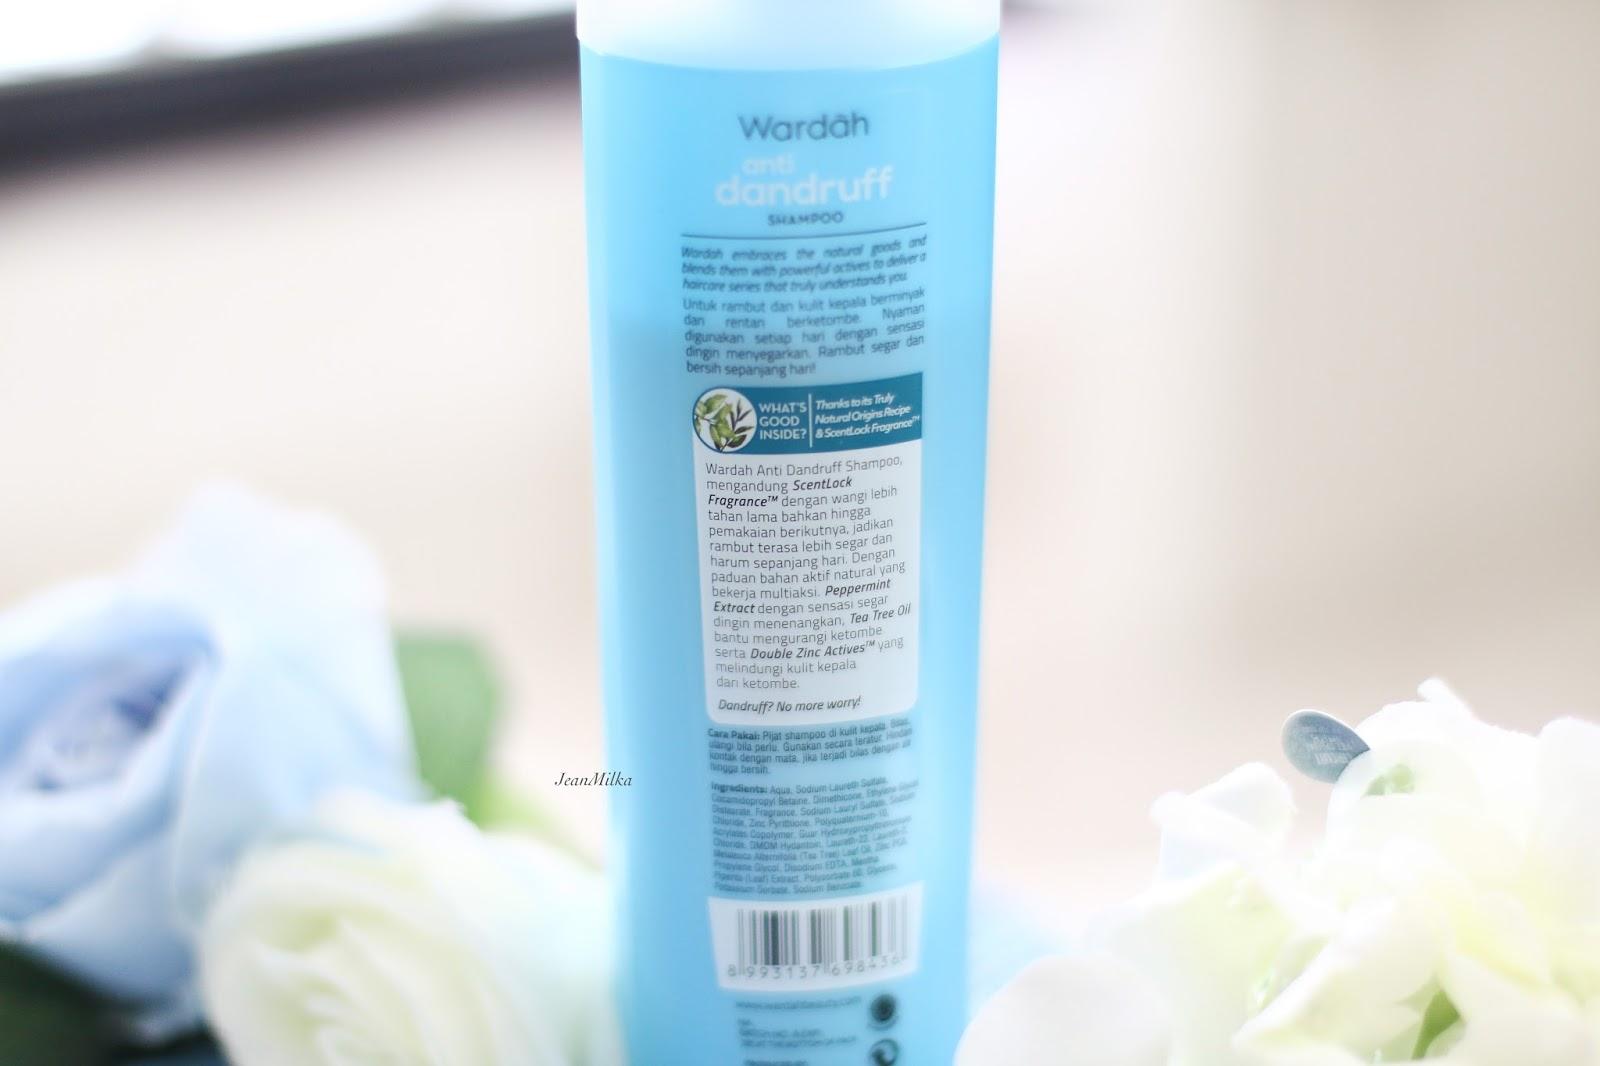 review, wardah, wardah shampoo, sampo wardah, sampo hijab, shampoo hijab, hijab, wardah beauty, wardah shampoo anti dendruff